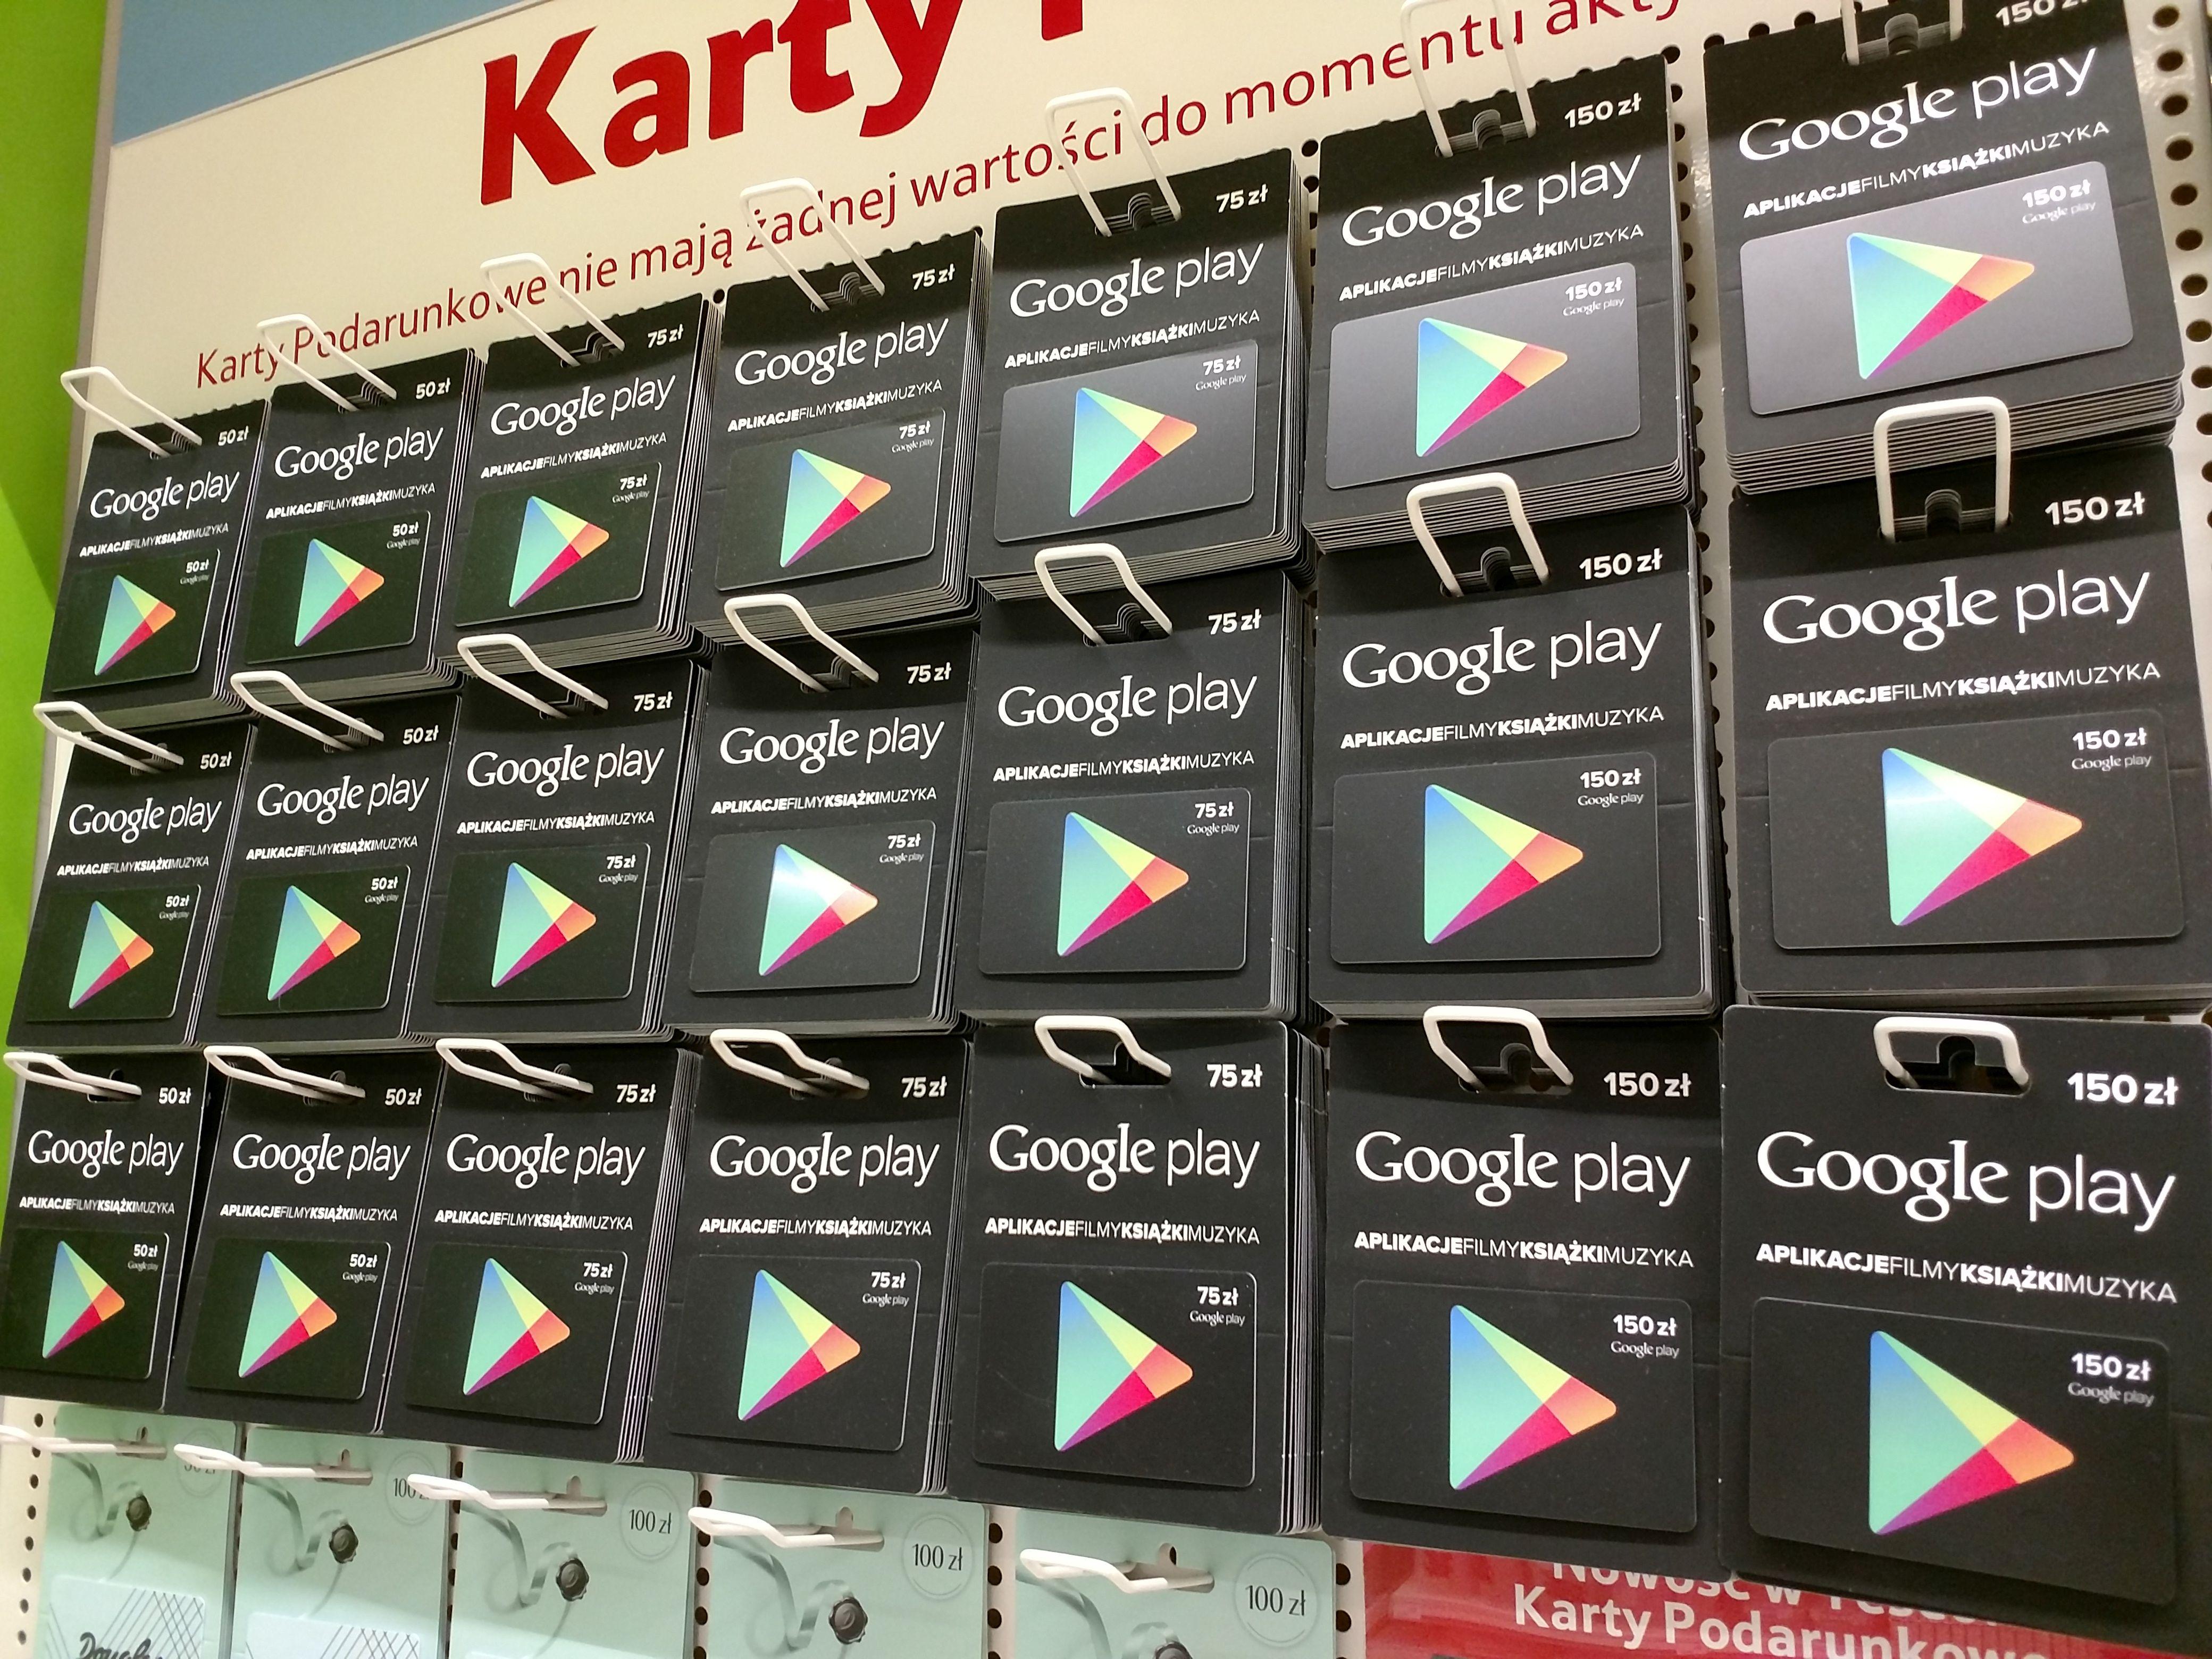 Gadzety I Akcesoria Mobilne Co Warto Kupic Do Smartfona